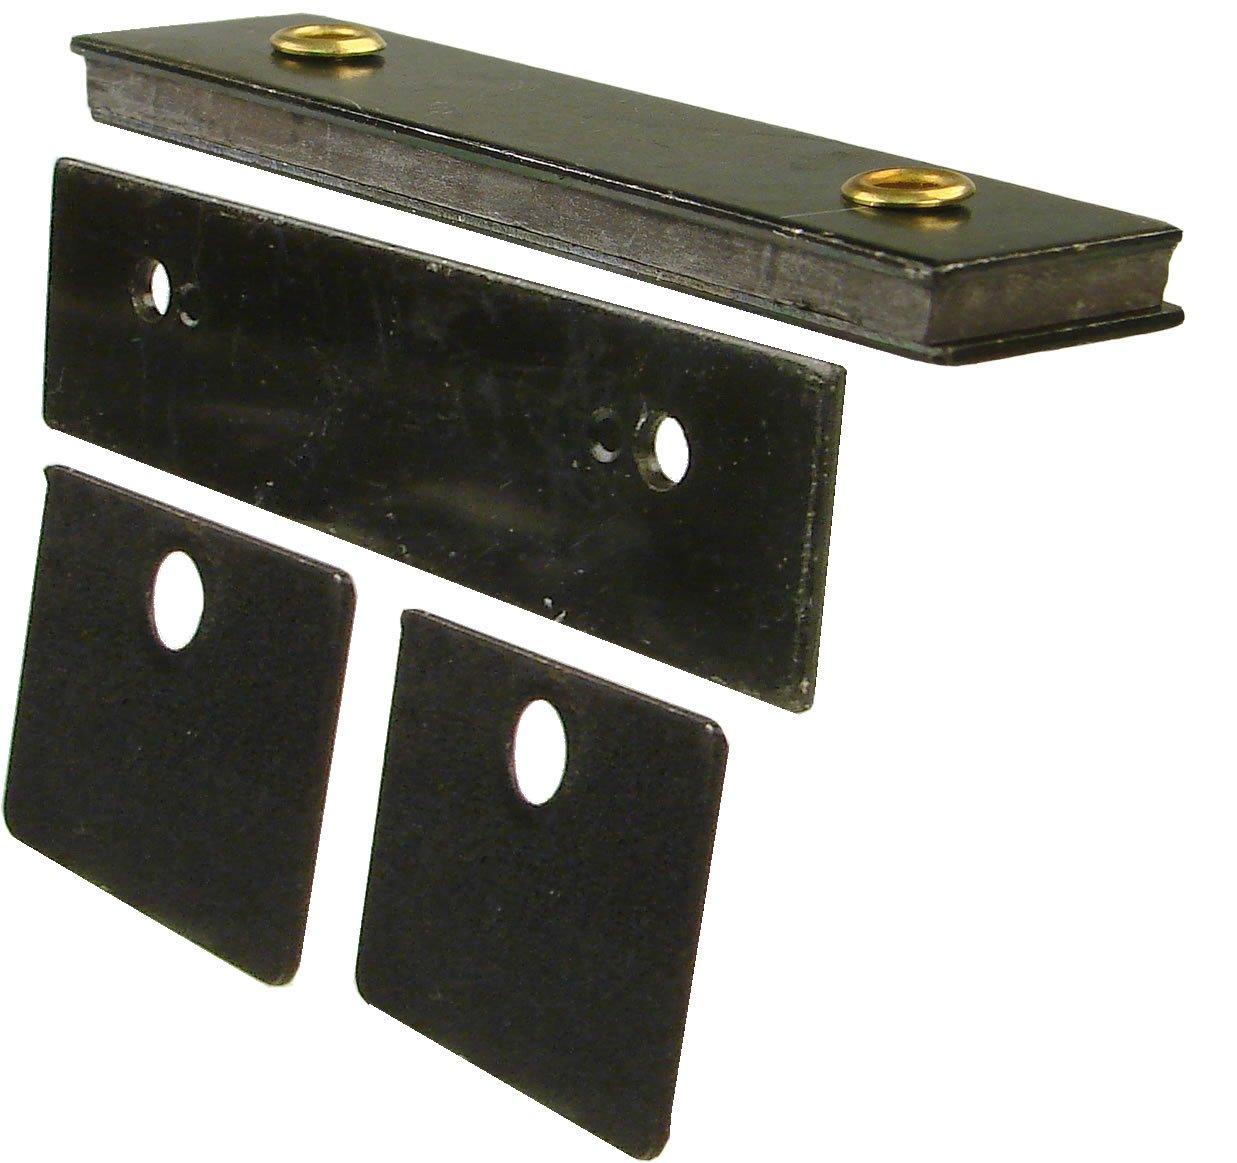 Monroe High Performance Magnetic Catch, Black Zinc Finish, 22 lbs Pull Power